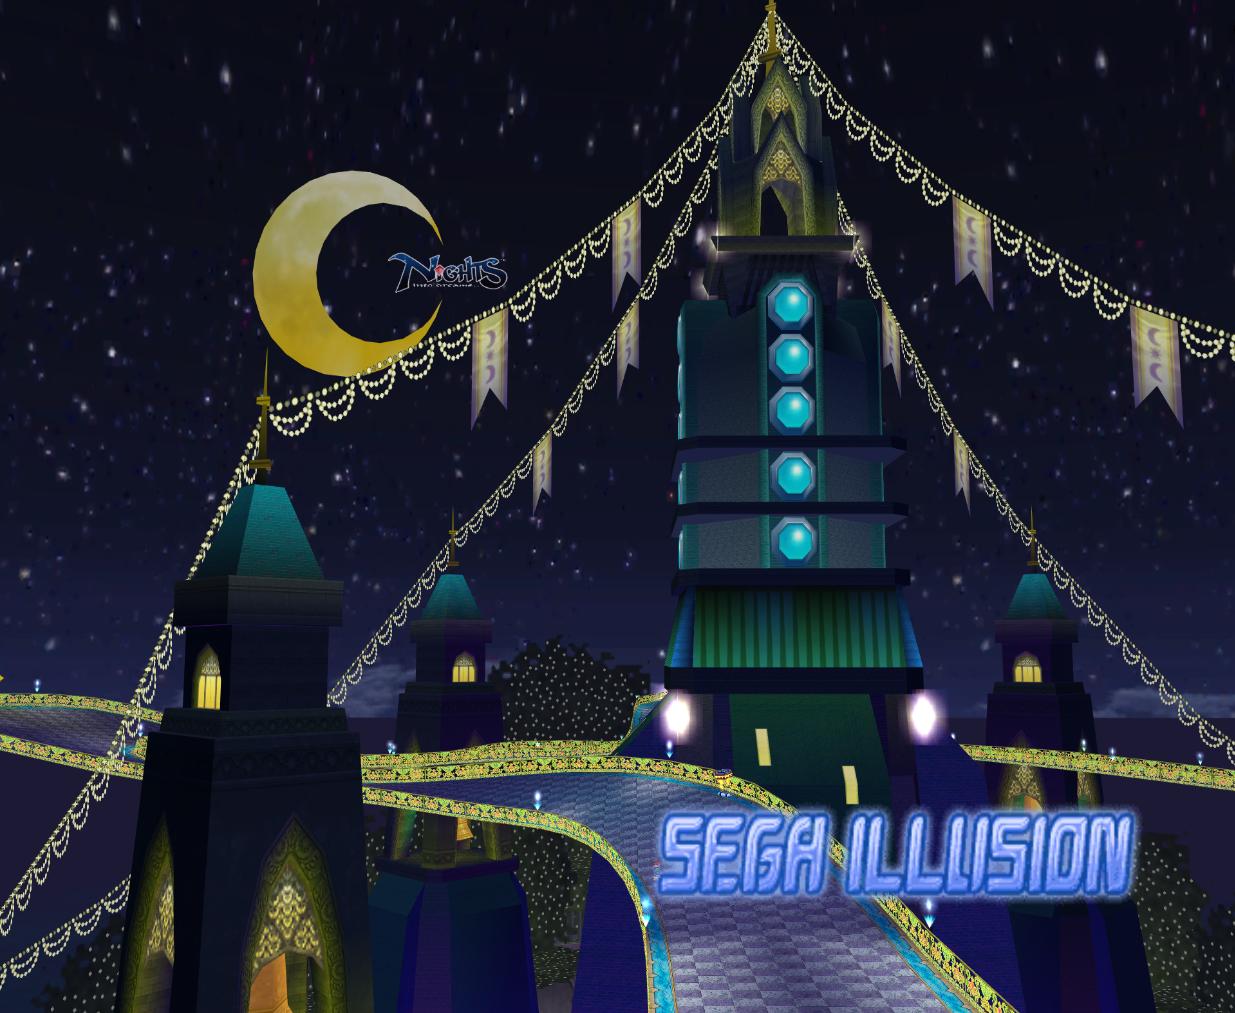 Sega Illusion